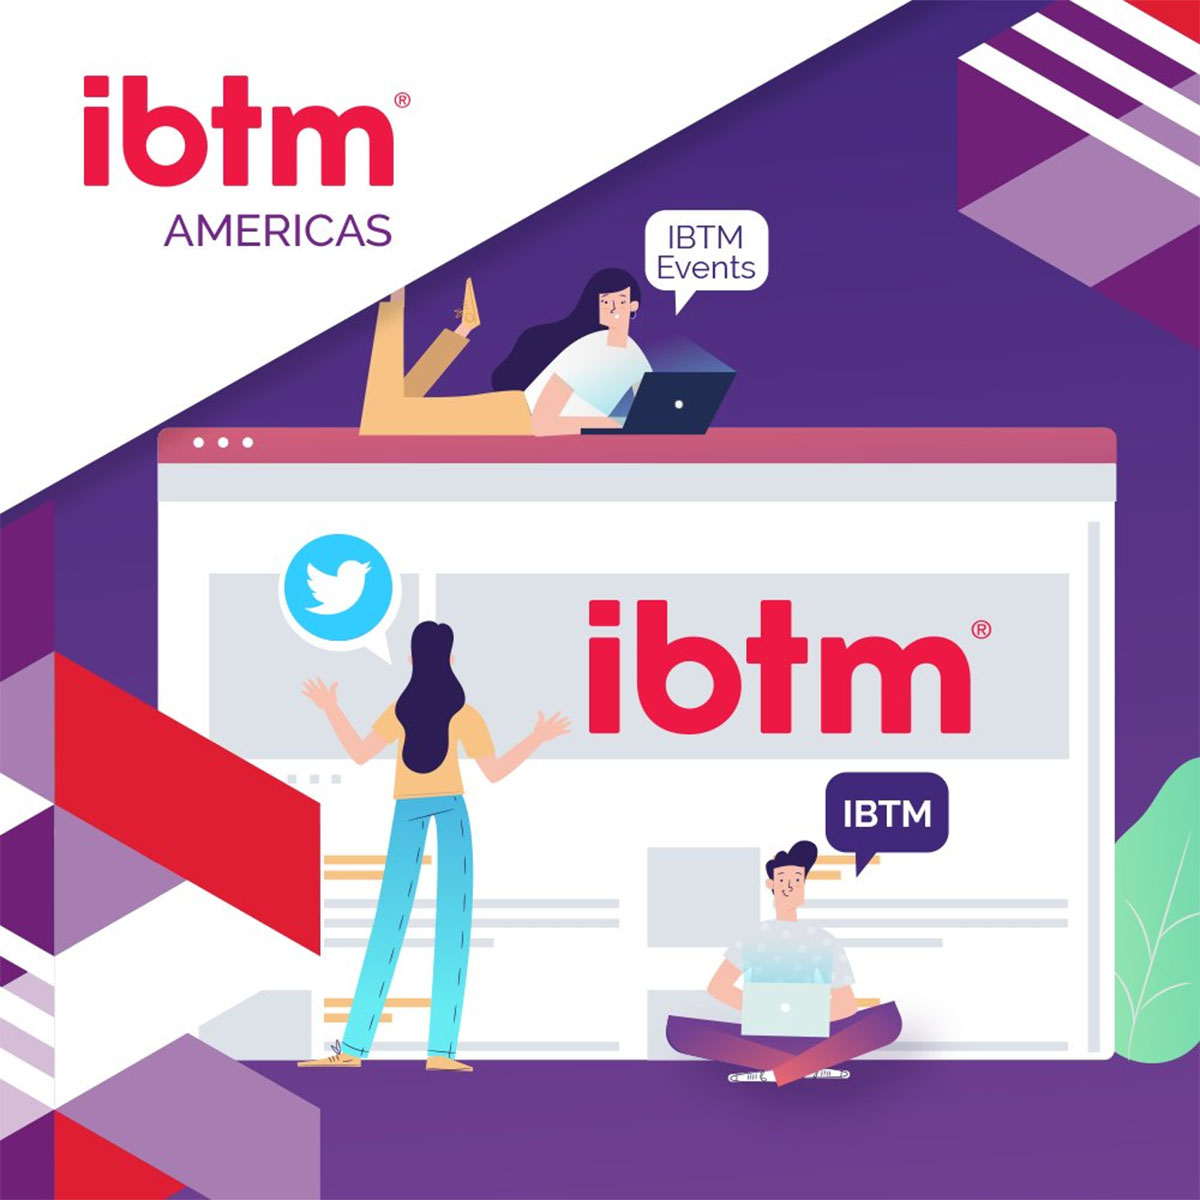 IBTM AMERICAS EVENTO VIRTUAL AGOSTO 03